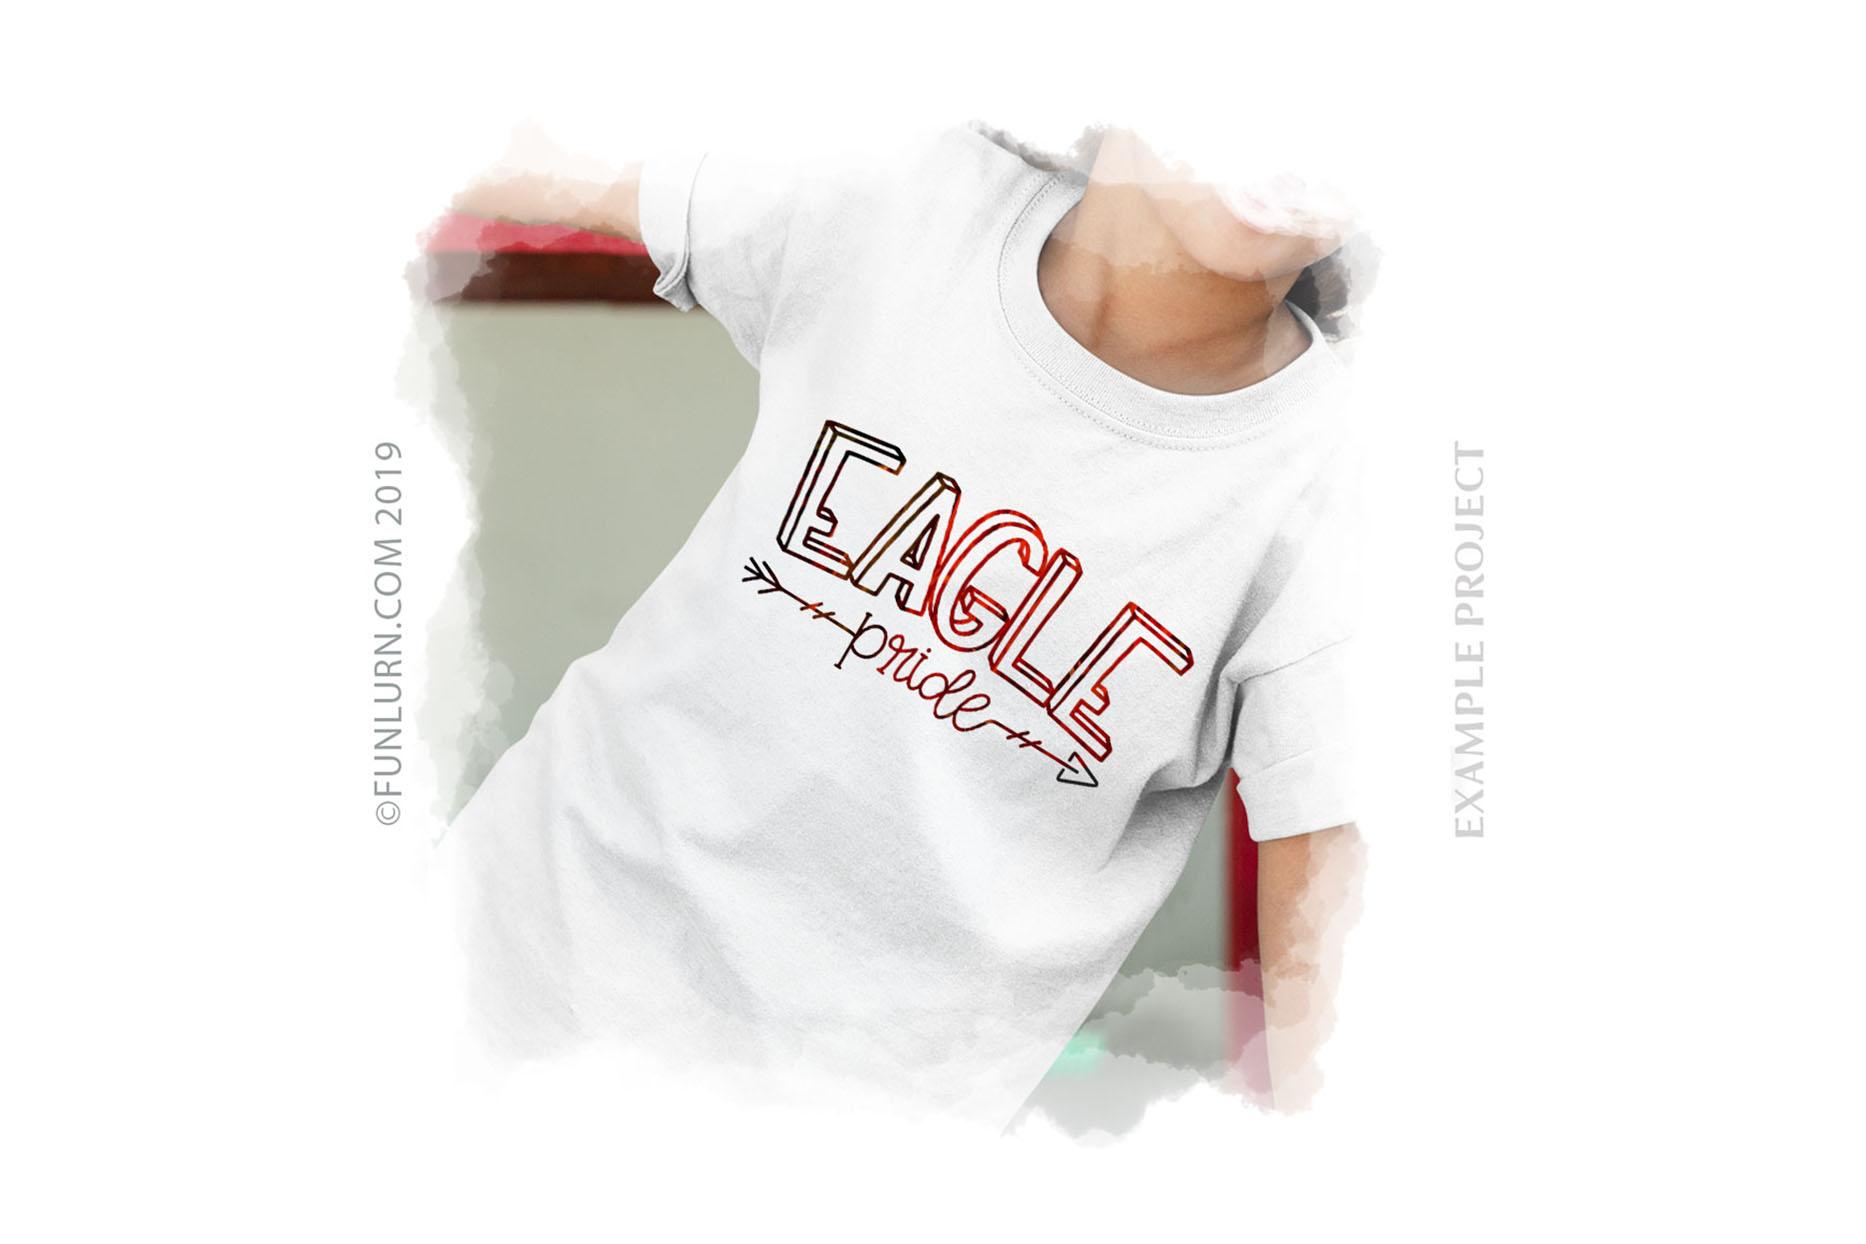 Eagle Pride Team SVG Cut File example image 3